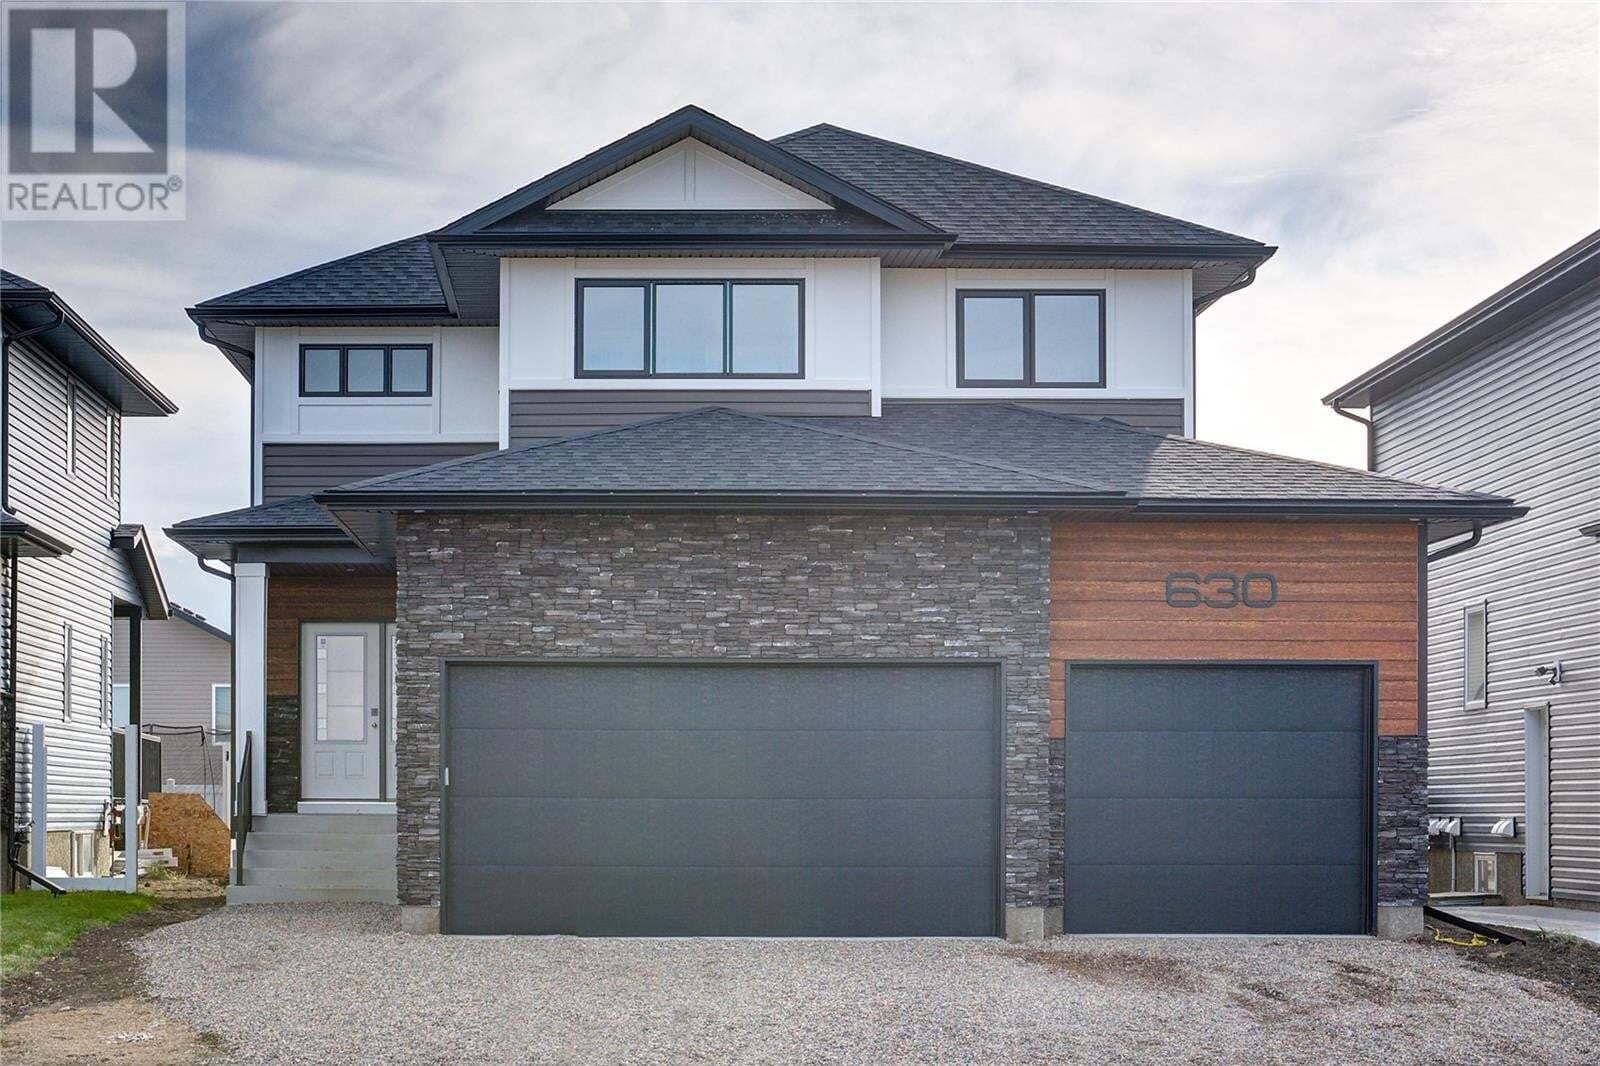 House for sale at 630 Boykowich Cres Saskatoon Saskatchewan - MLS: SK810193